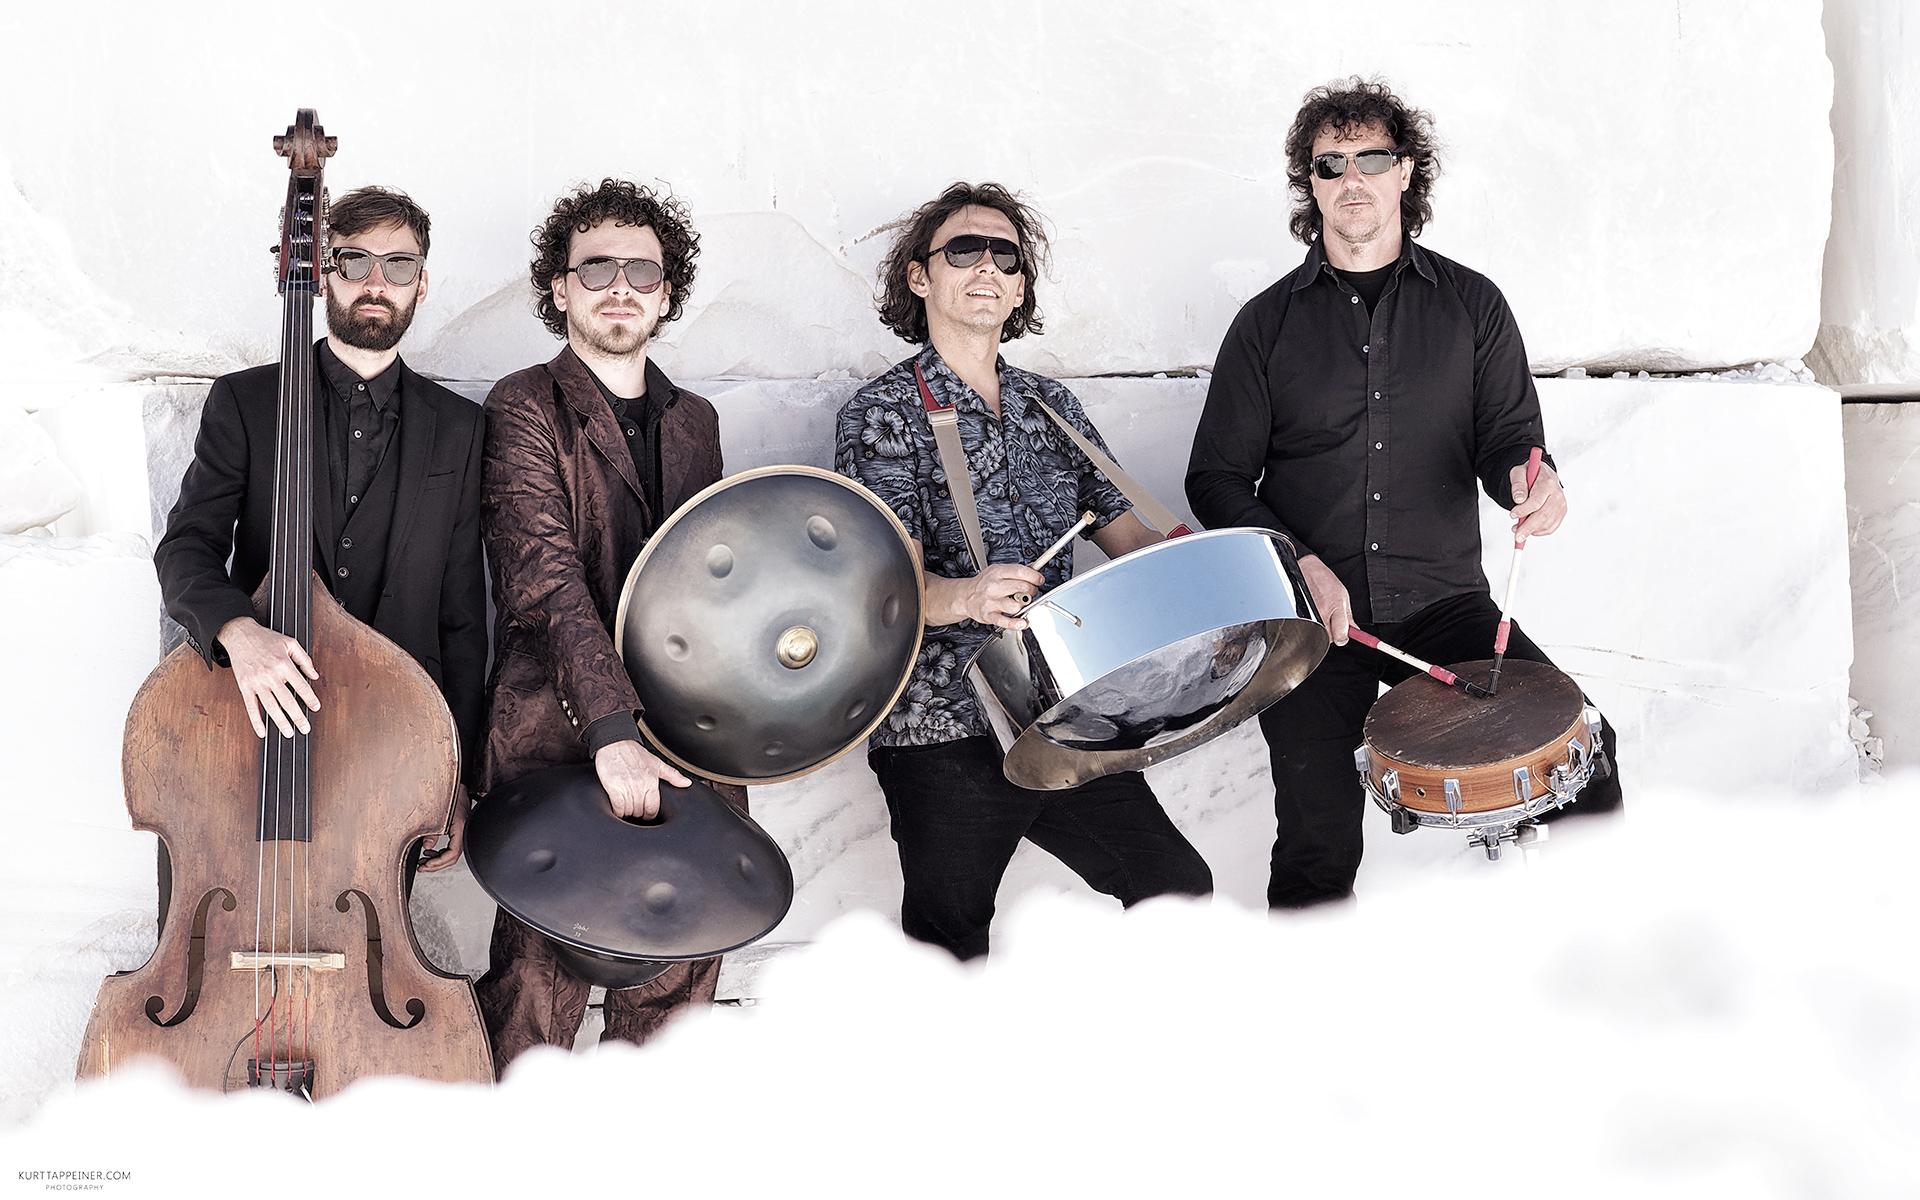 JEMM - Band